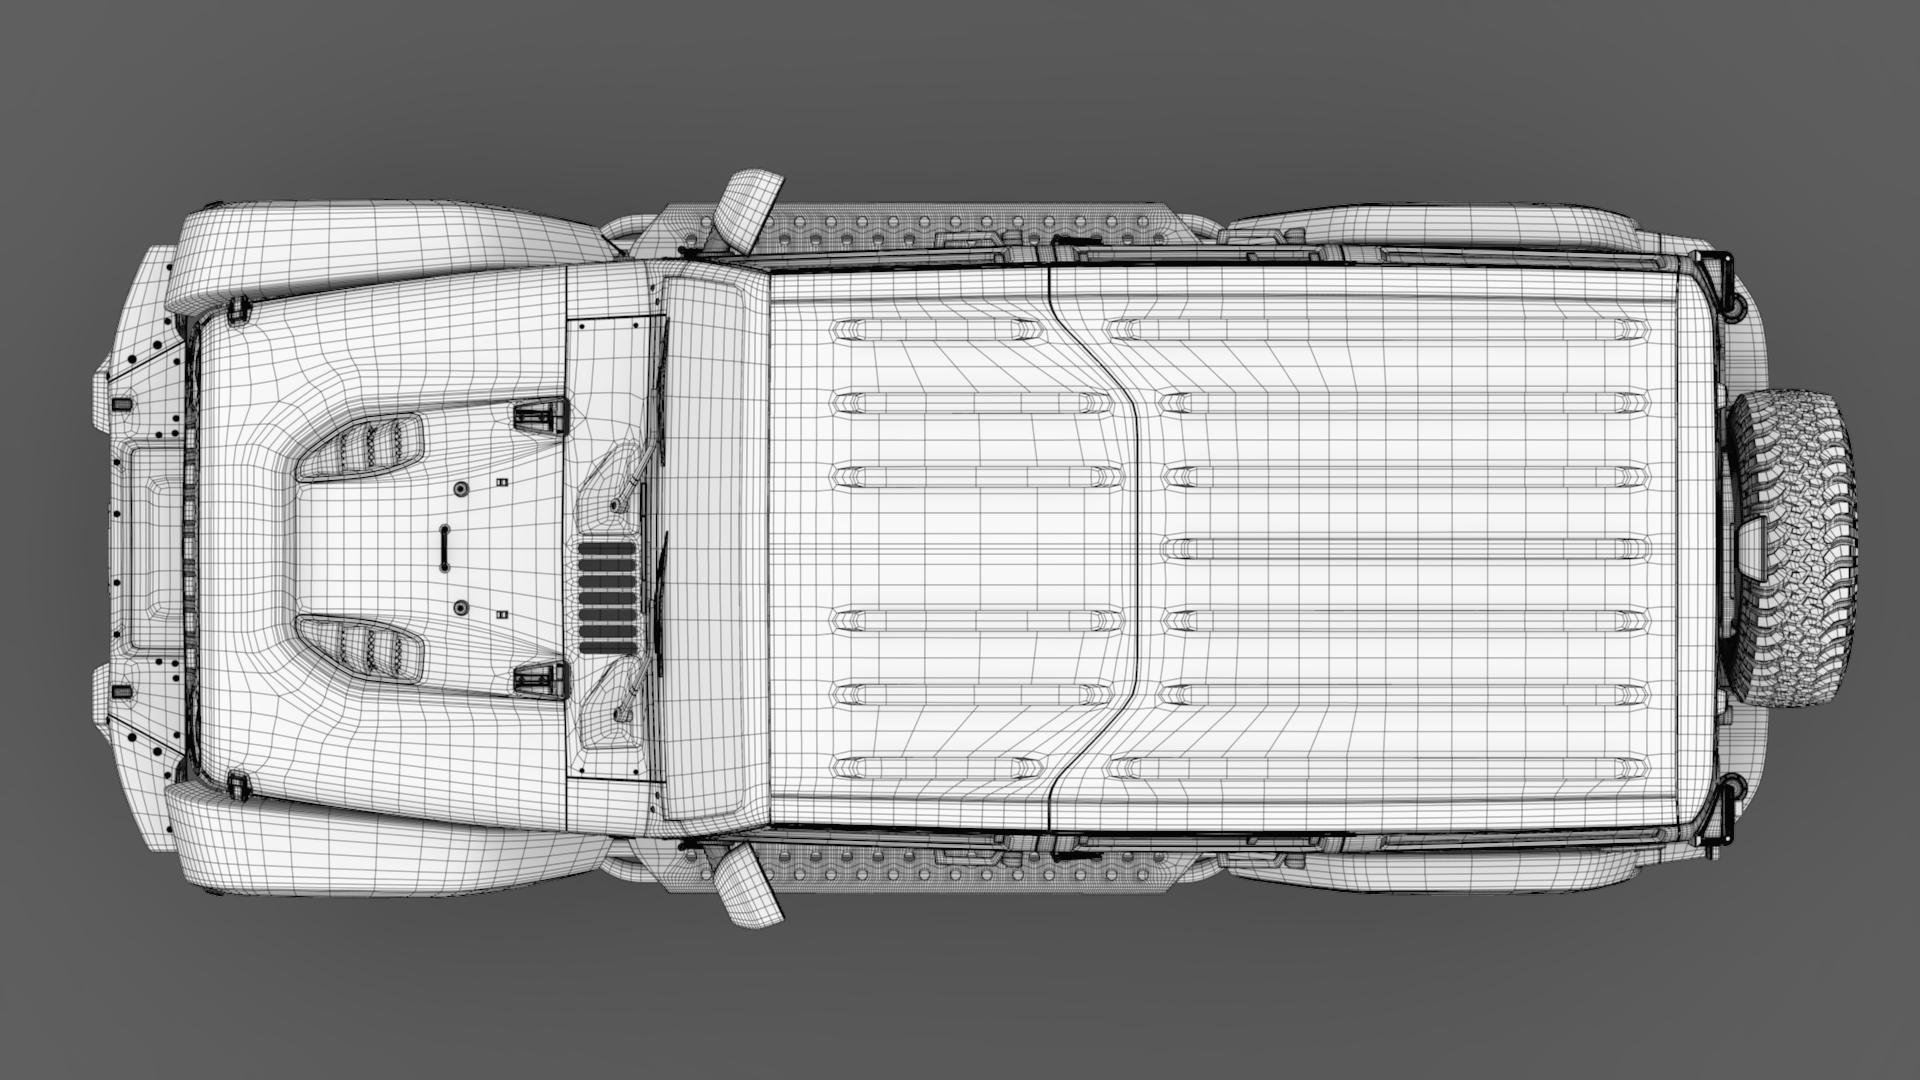 jeep wrangler unlimited rubicon recon jk 2017 3d model max fbx c4d lwo ma mb hrc xsi obj 277014